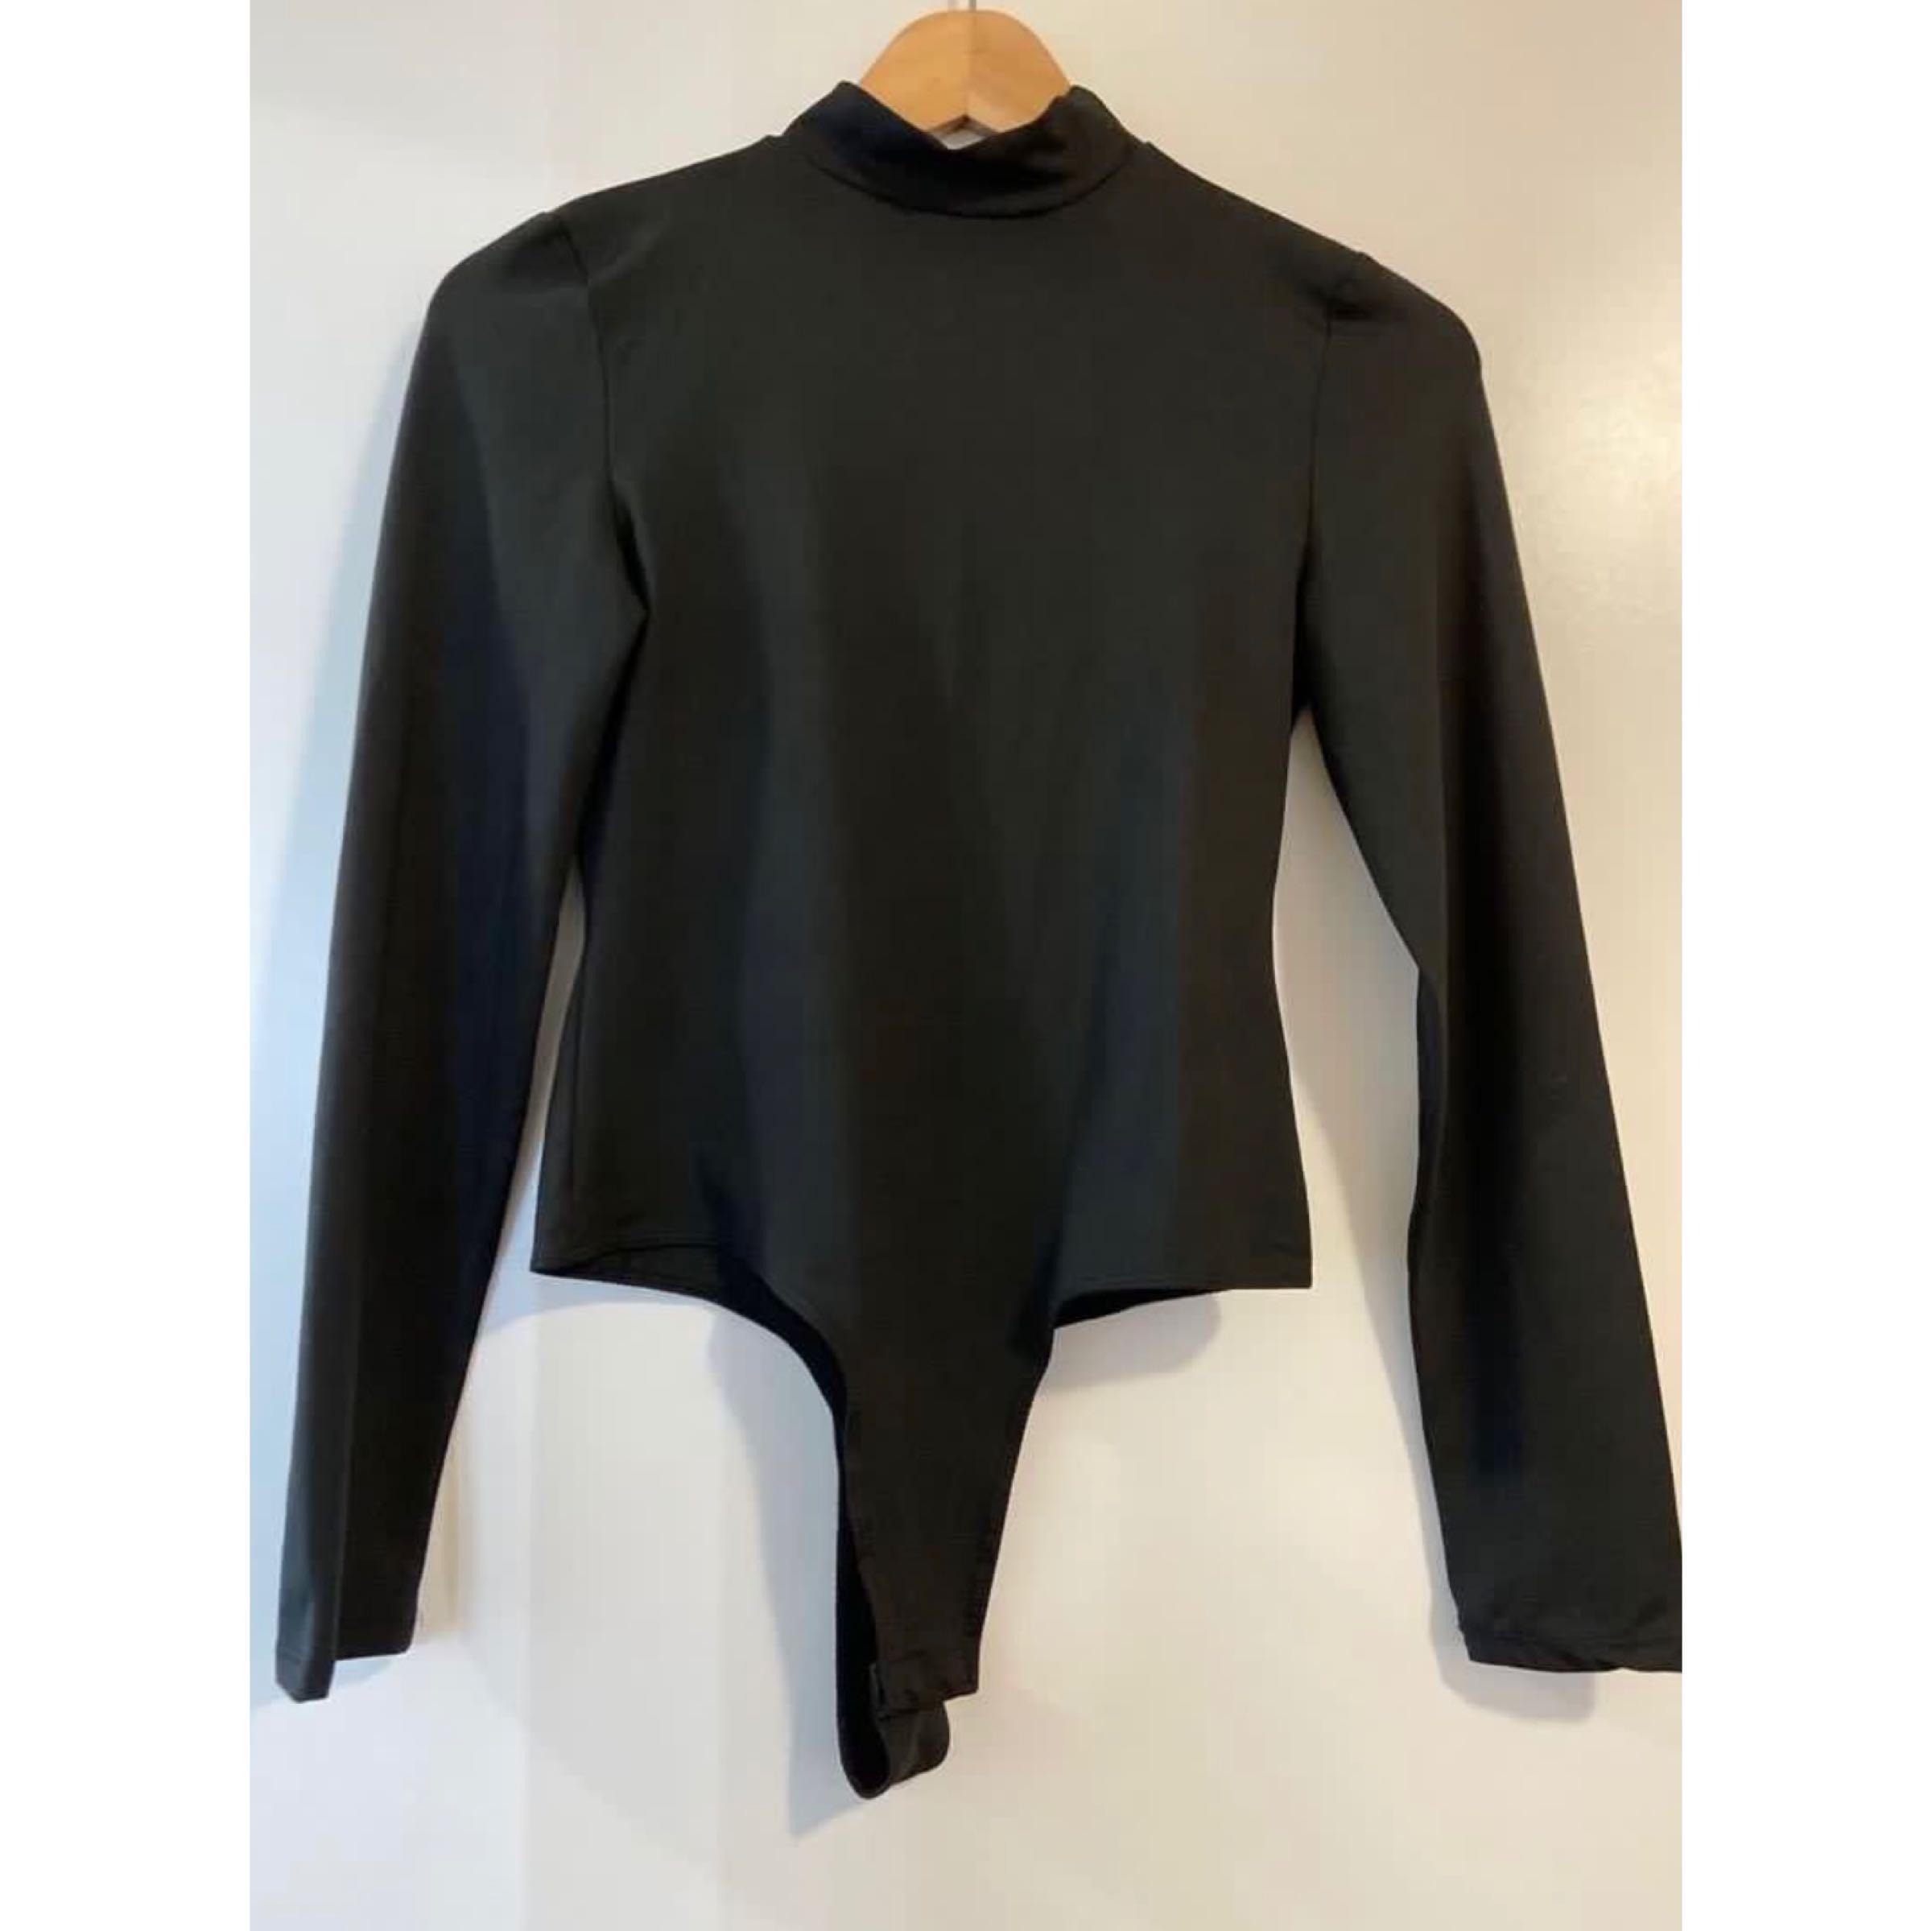 mendocino black mockneck bodysuit